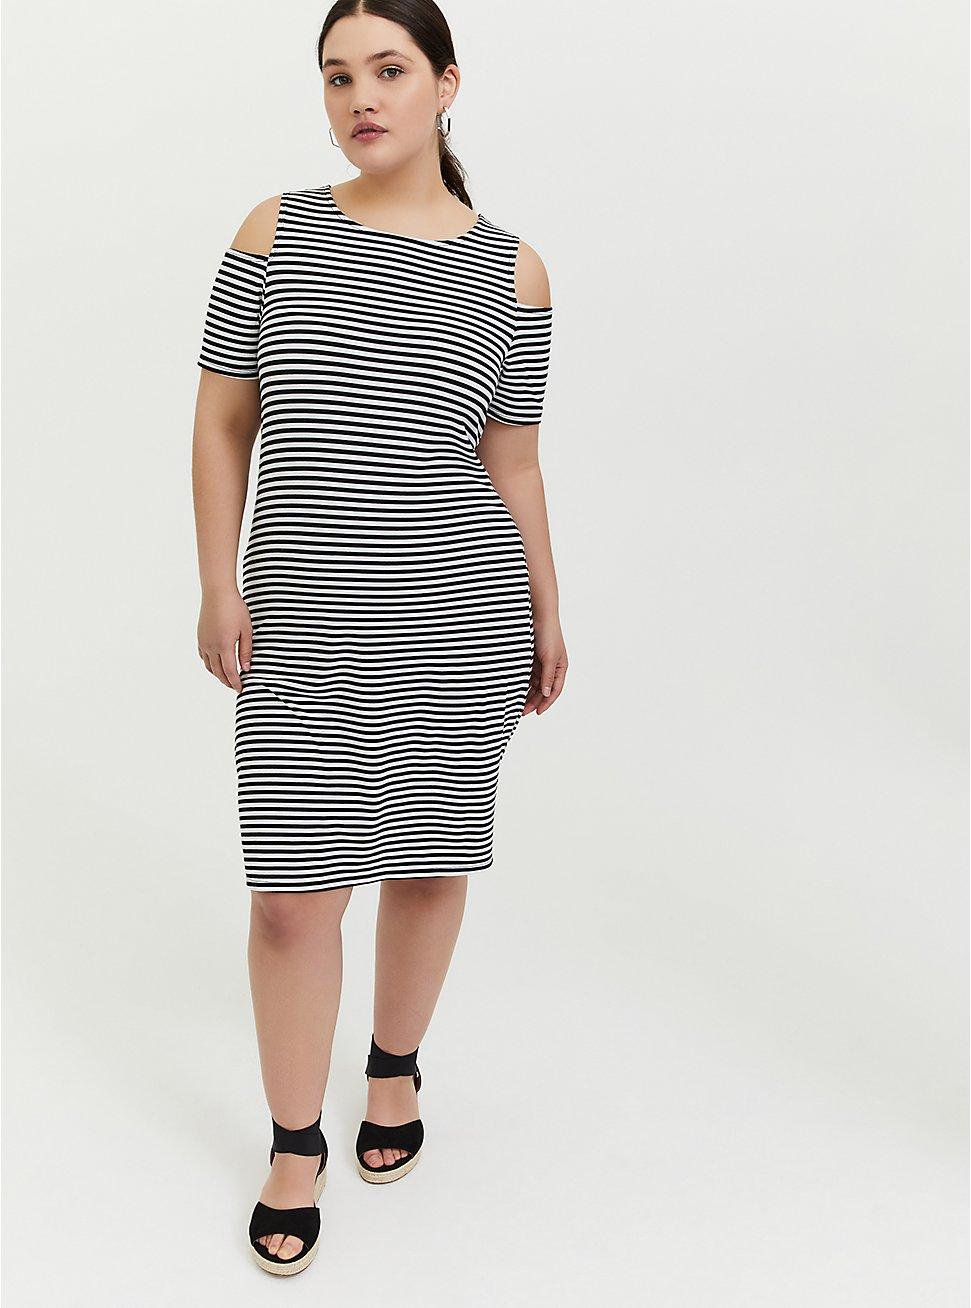 Black & White Stripe Jersey Cold Shoulder Mini Shift Dress, STRIPE-BLACK WHITE, hi-res